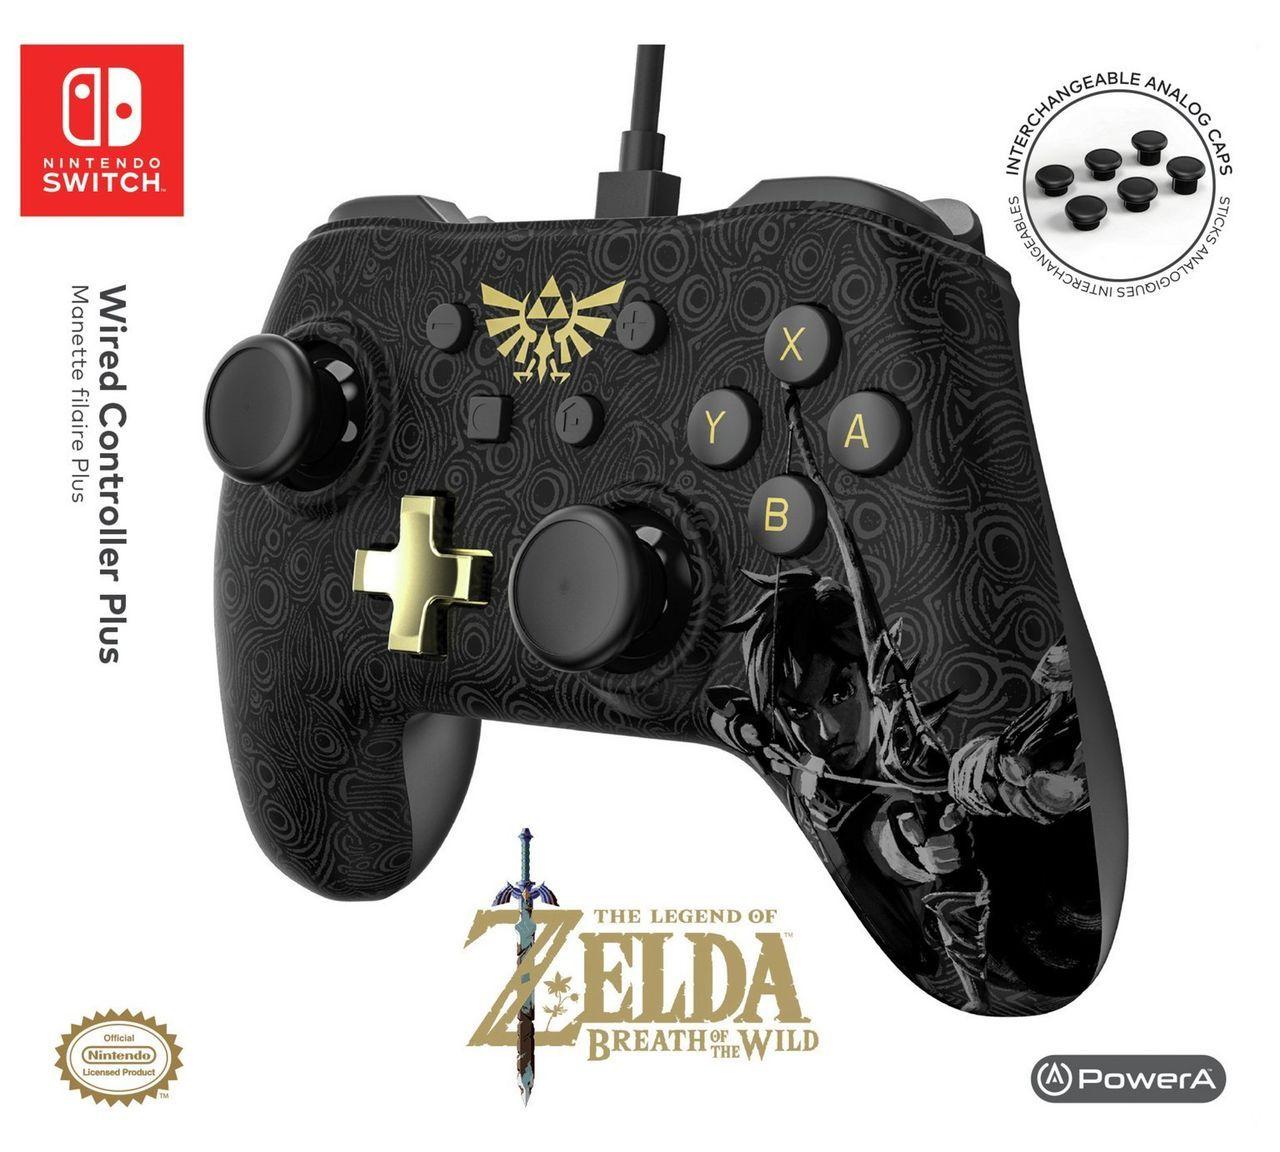 mira-los-nuevos-mandos4-cable-nintendo-switch-power-frikigamers.com